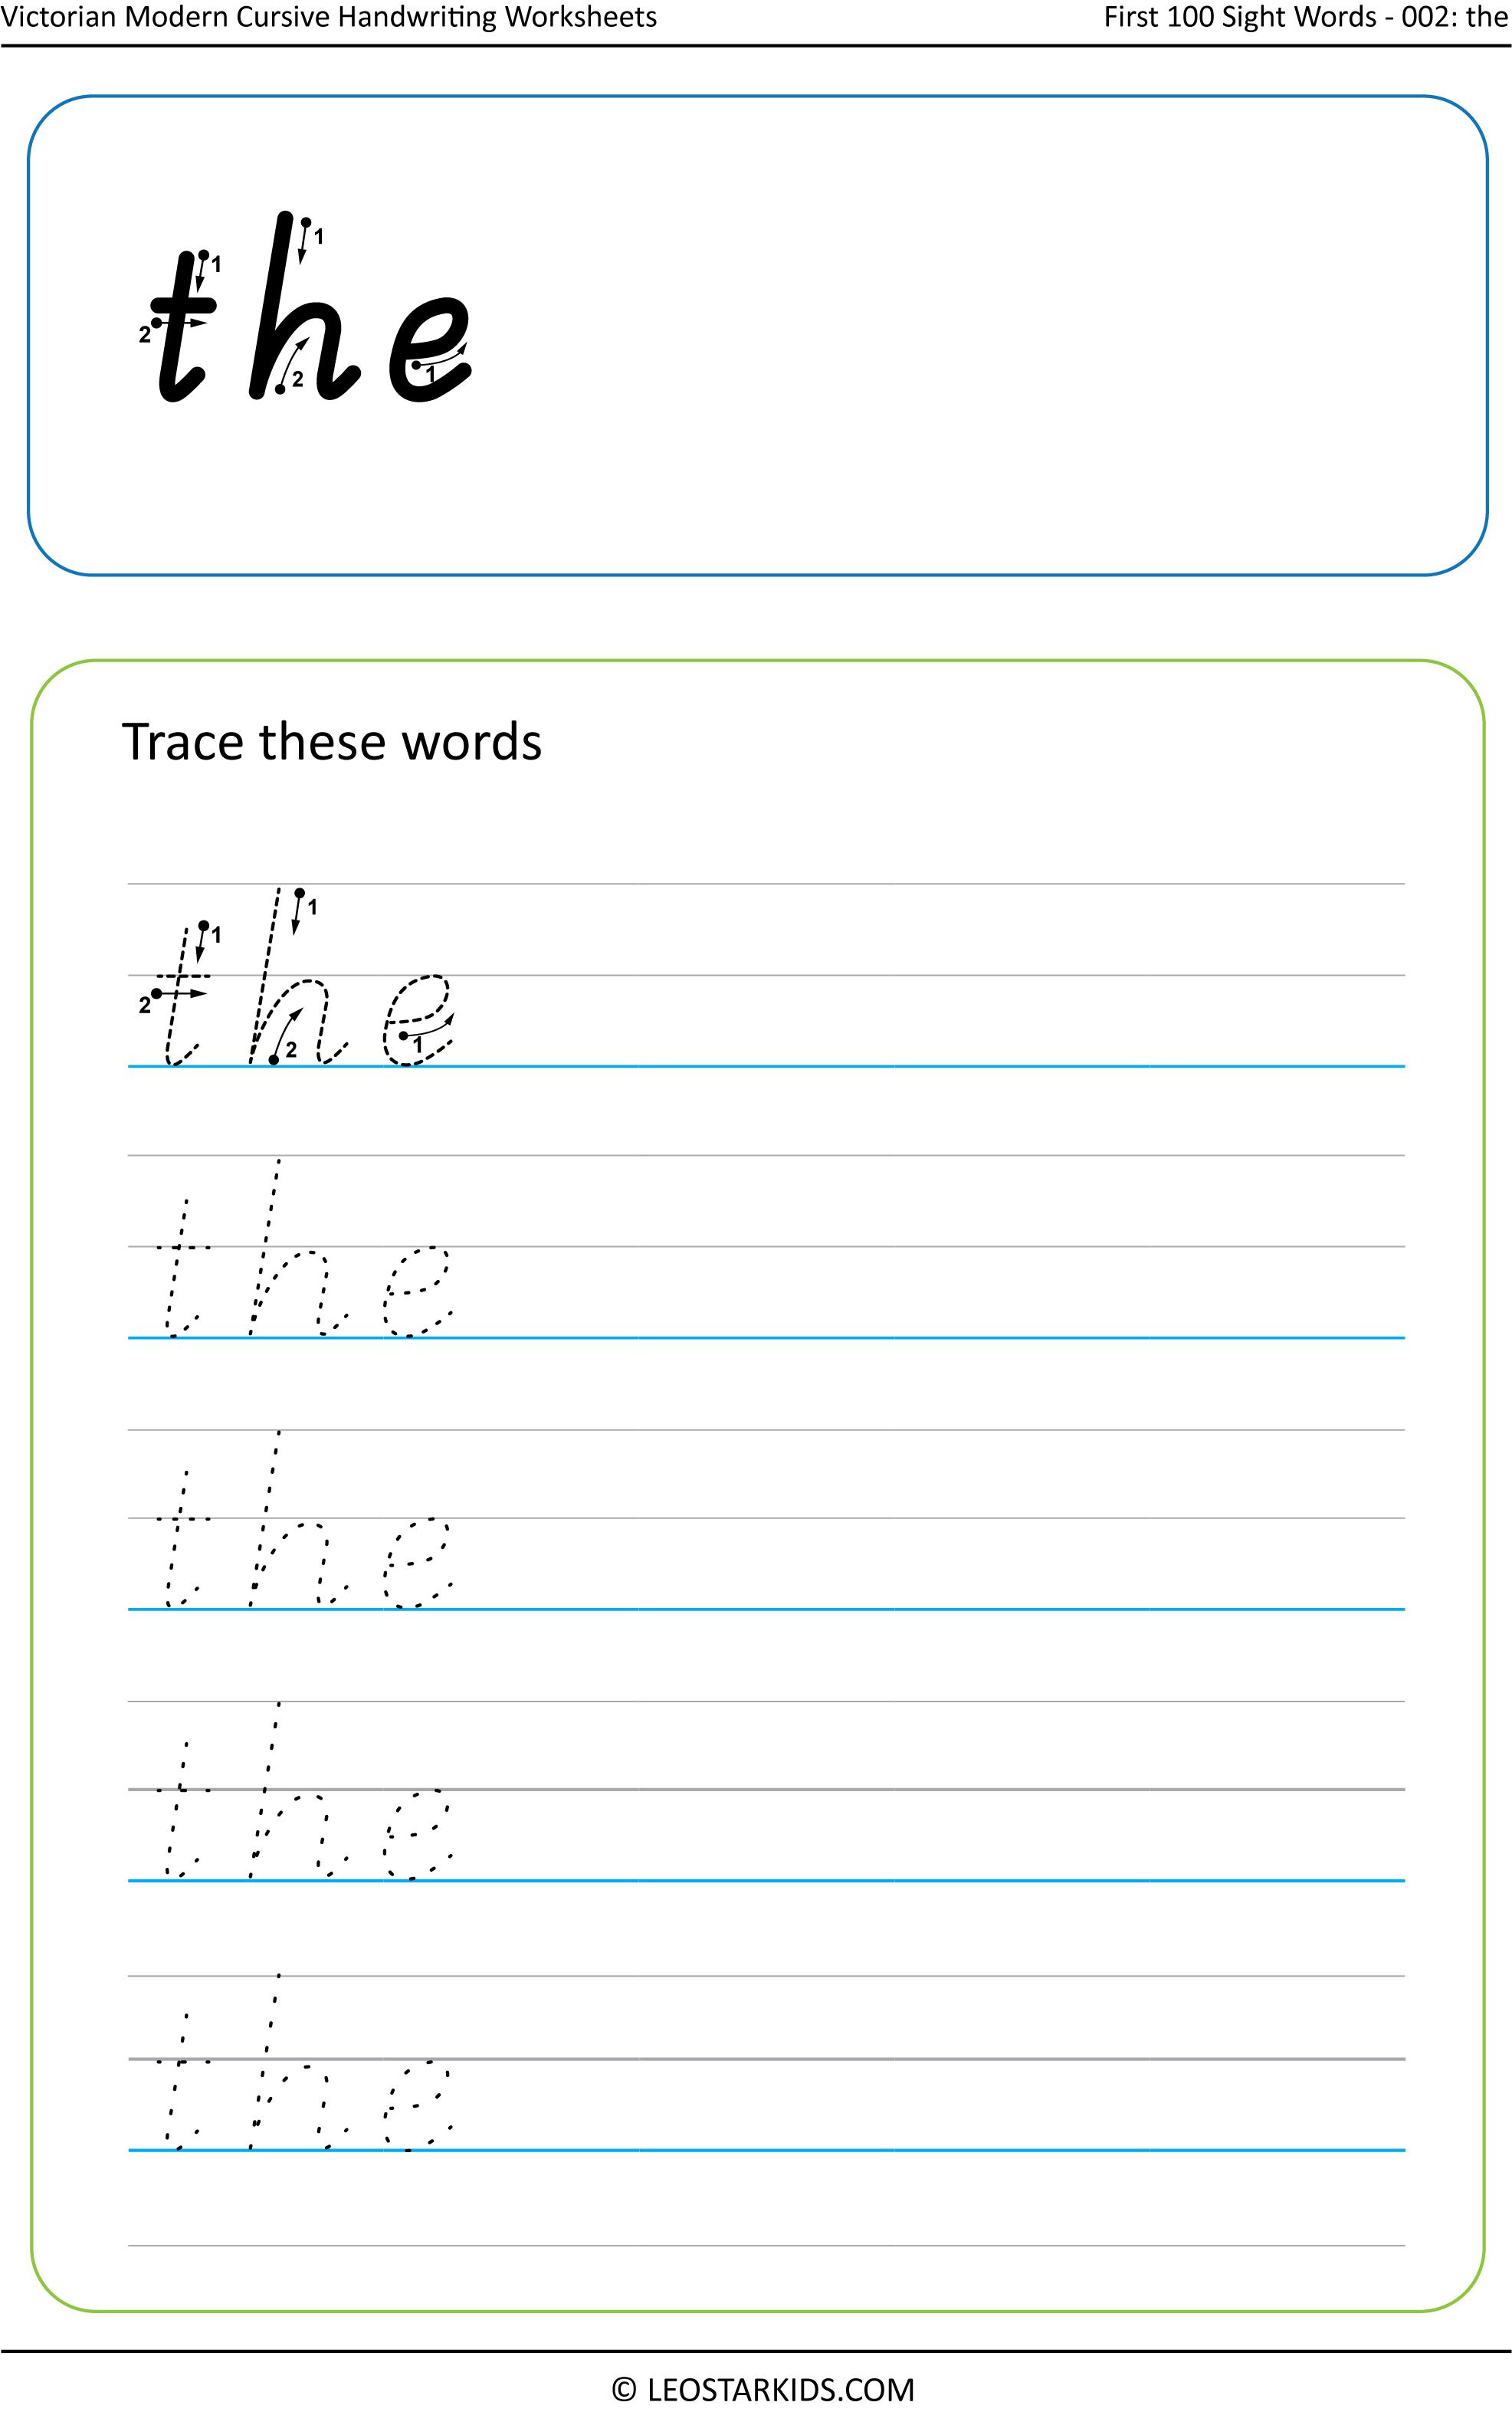 Australian Handwriting Worksheets – Victorian Modern Cursive